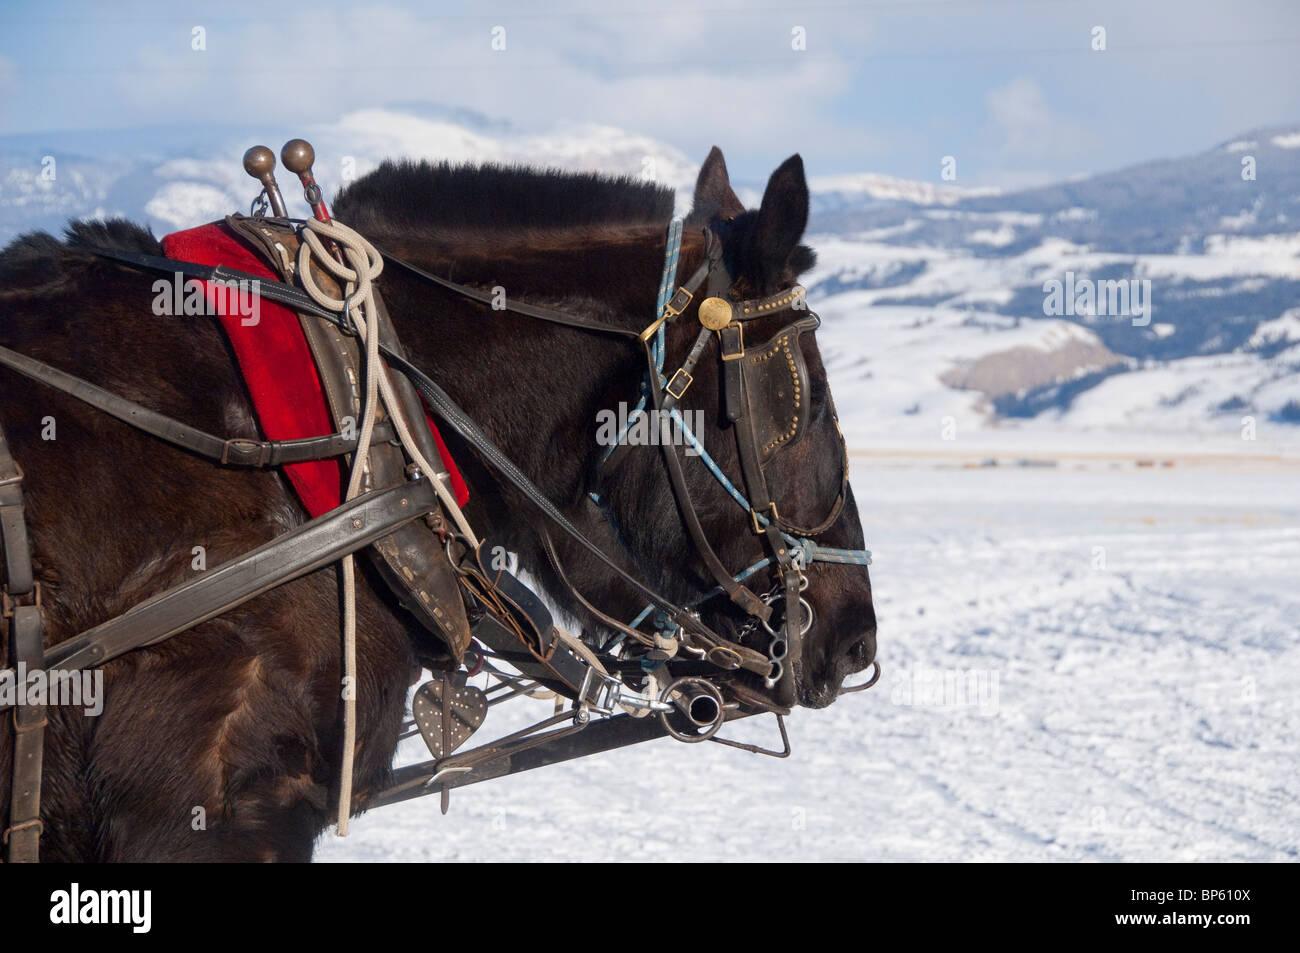 USA, Wyoming, Jackson Hole. National Elk Refuge in winter. Black draft horse team that pull winter sleigh. - Stock Image